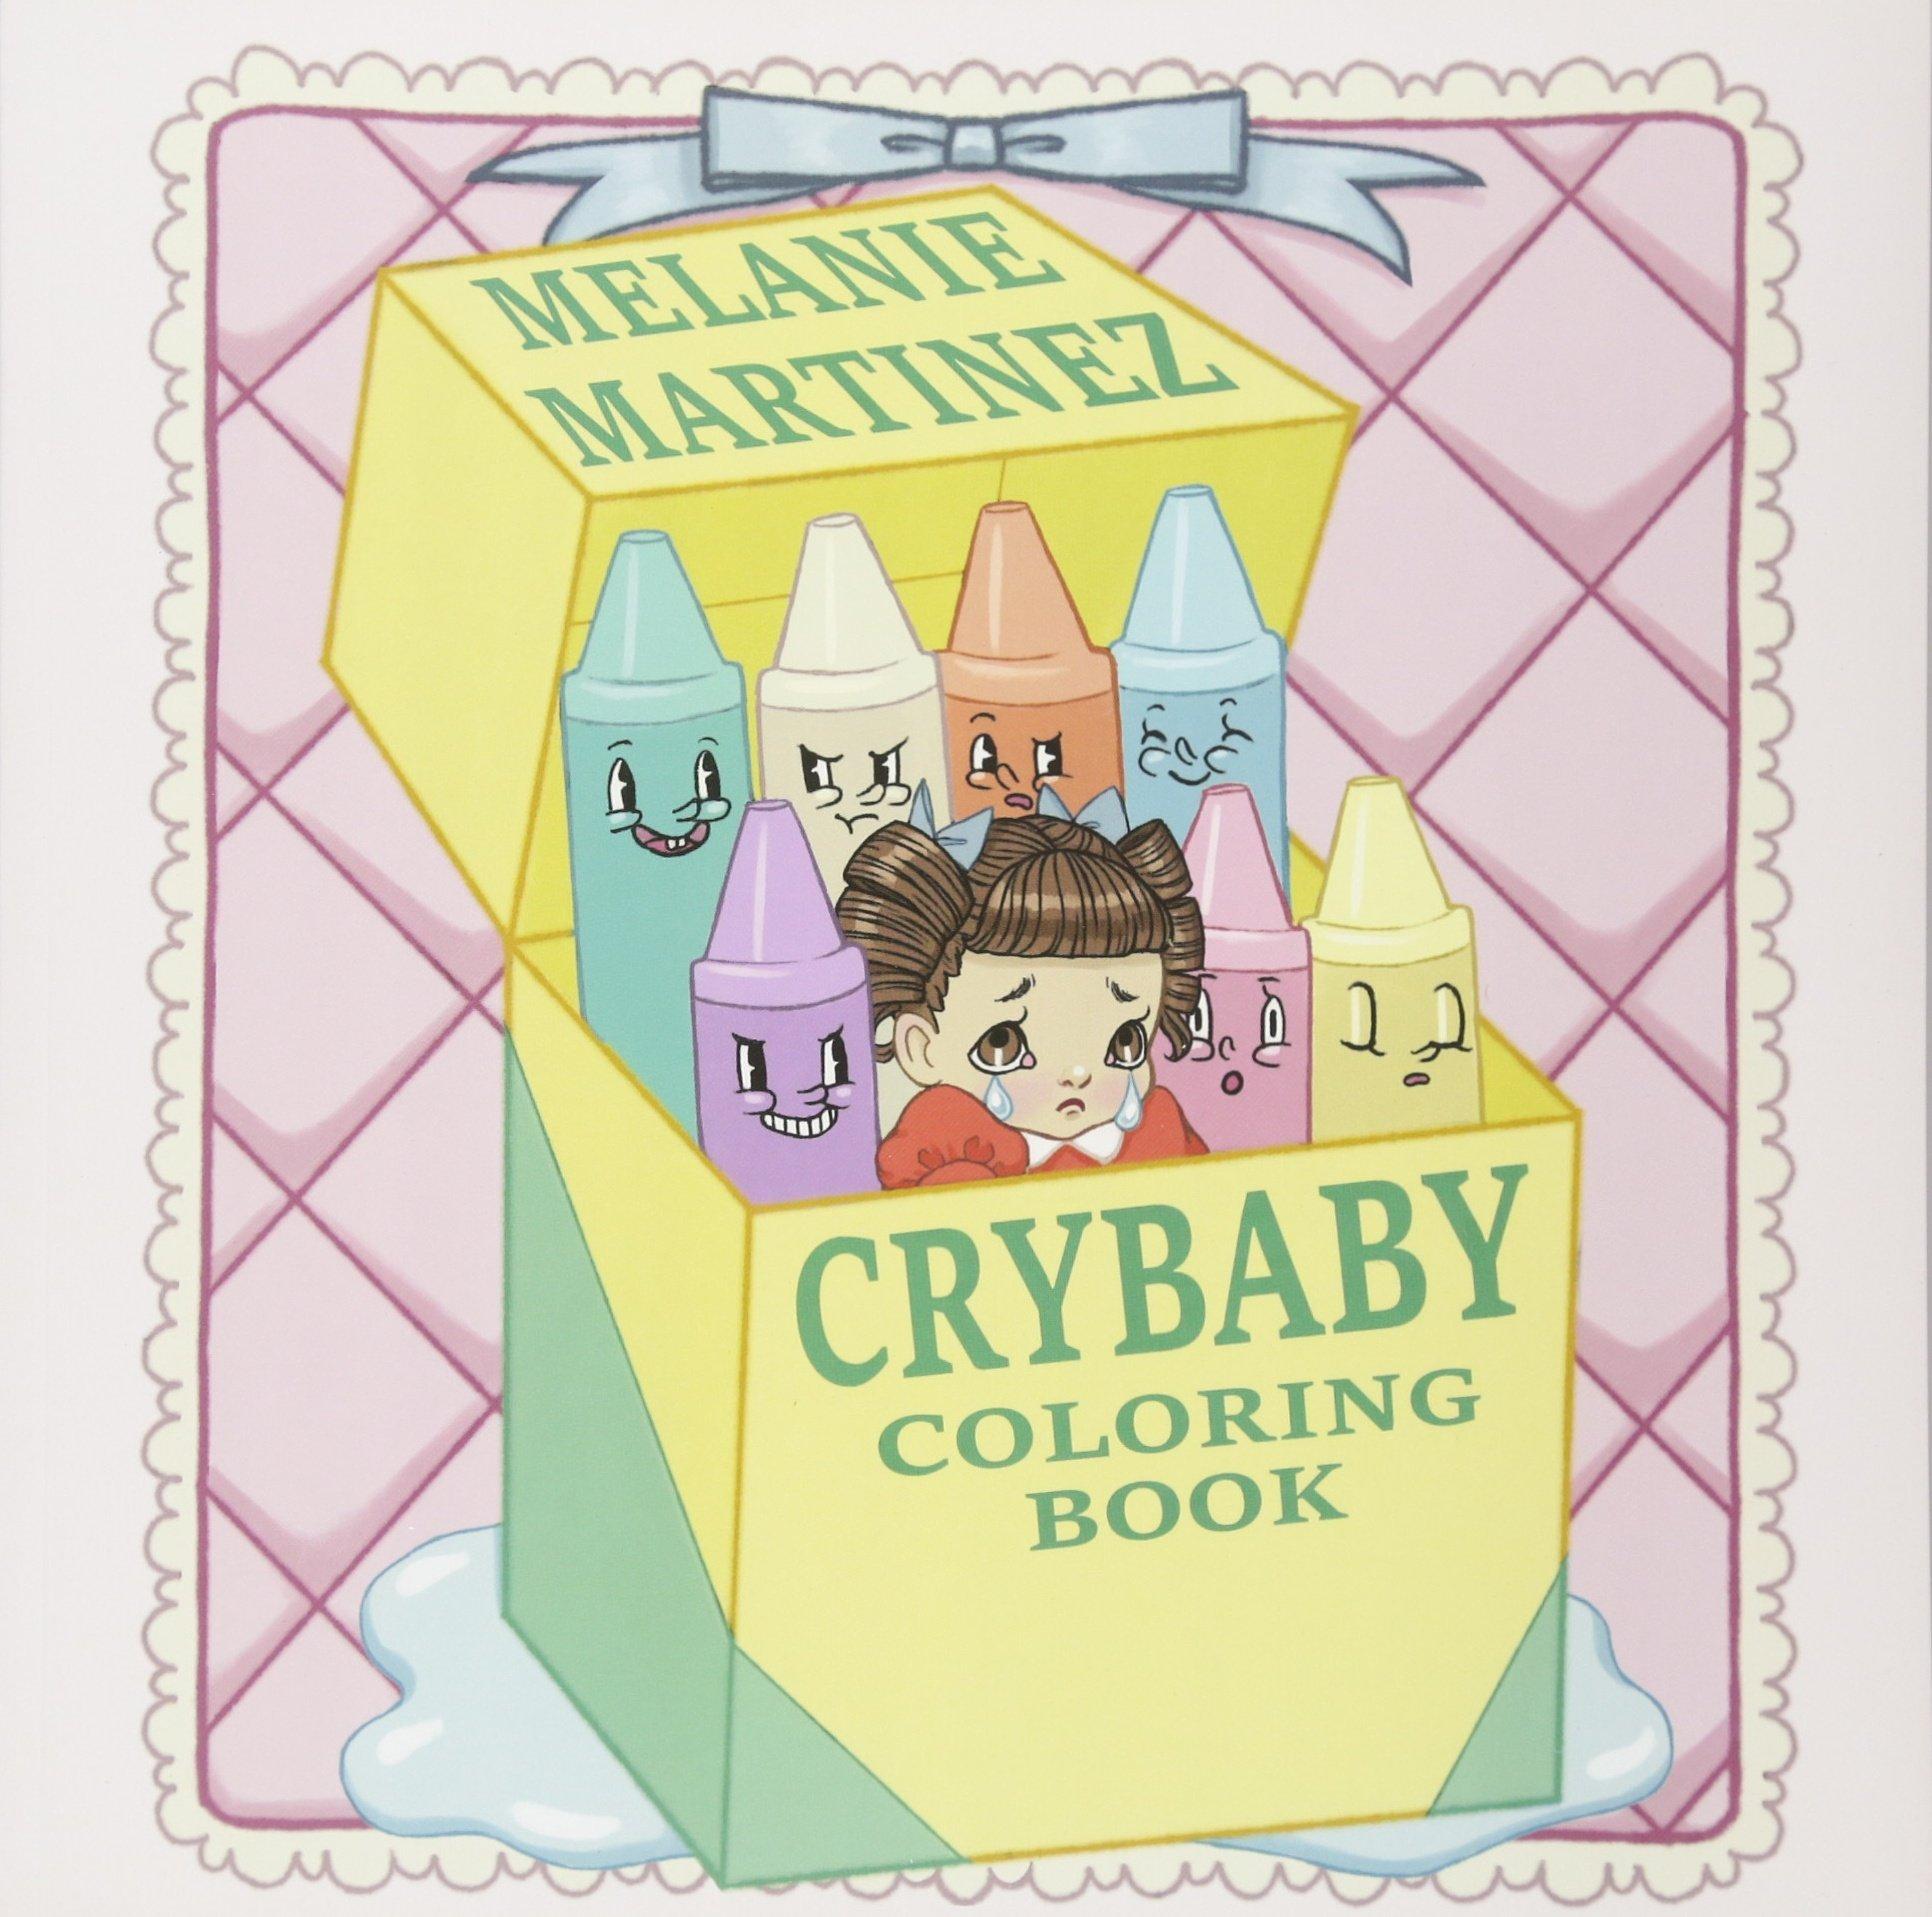 Cry Baby Coloring Book: Melanie Martinez: 9781612436869: Amazon.com ...